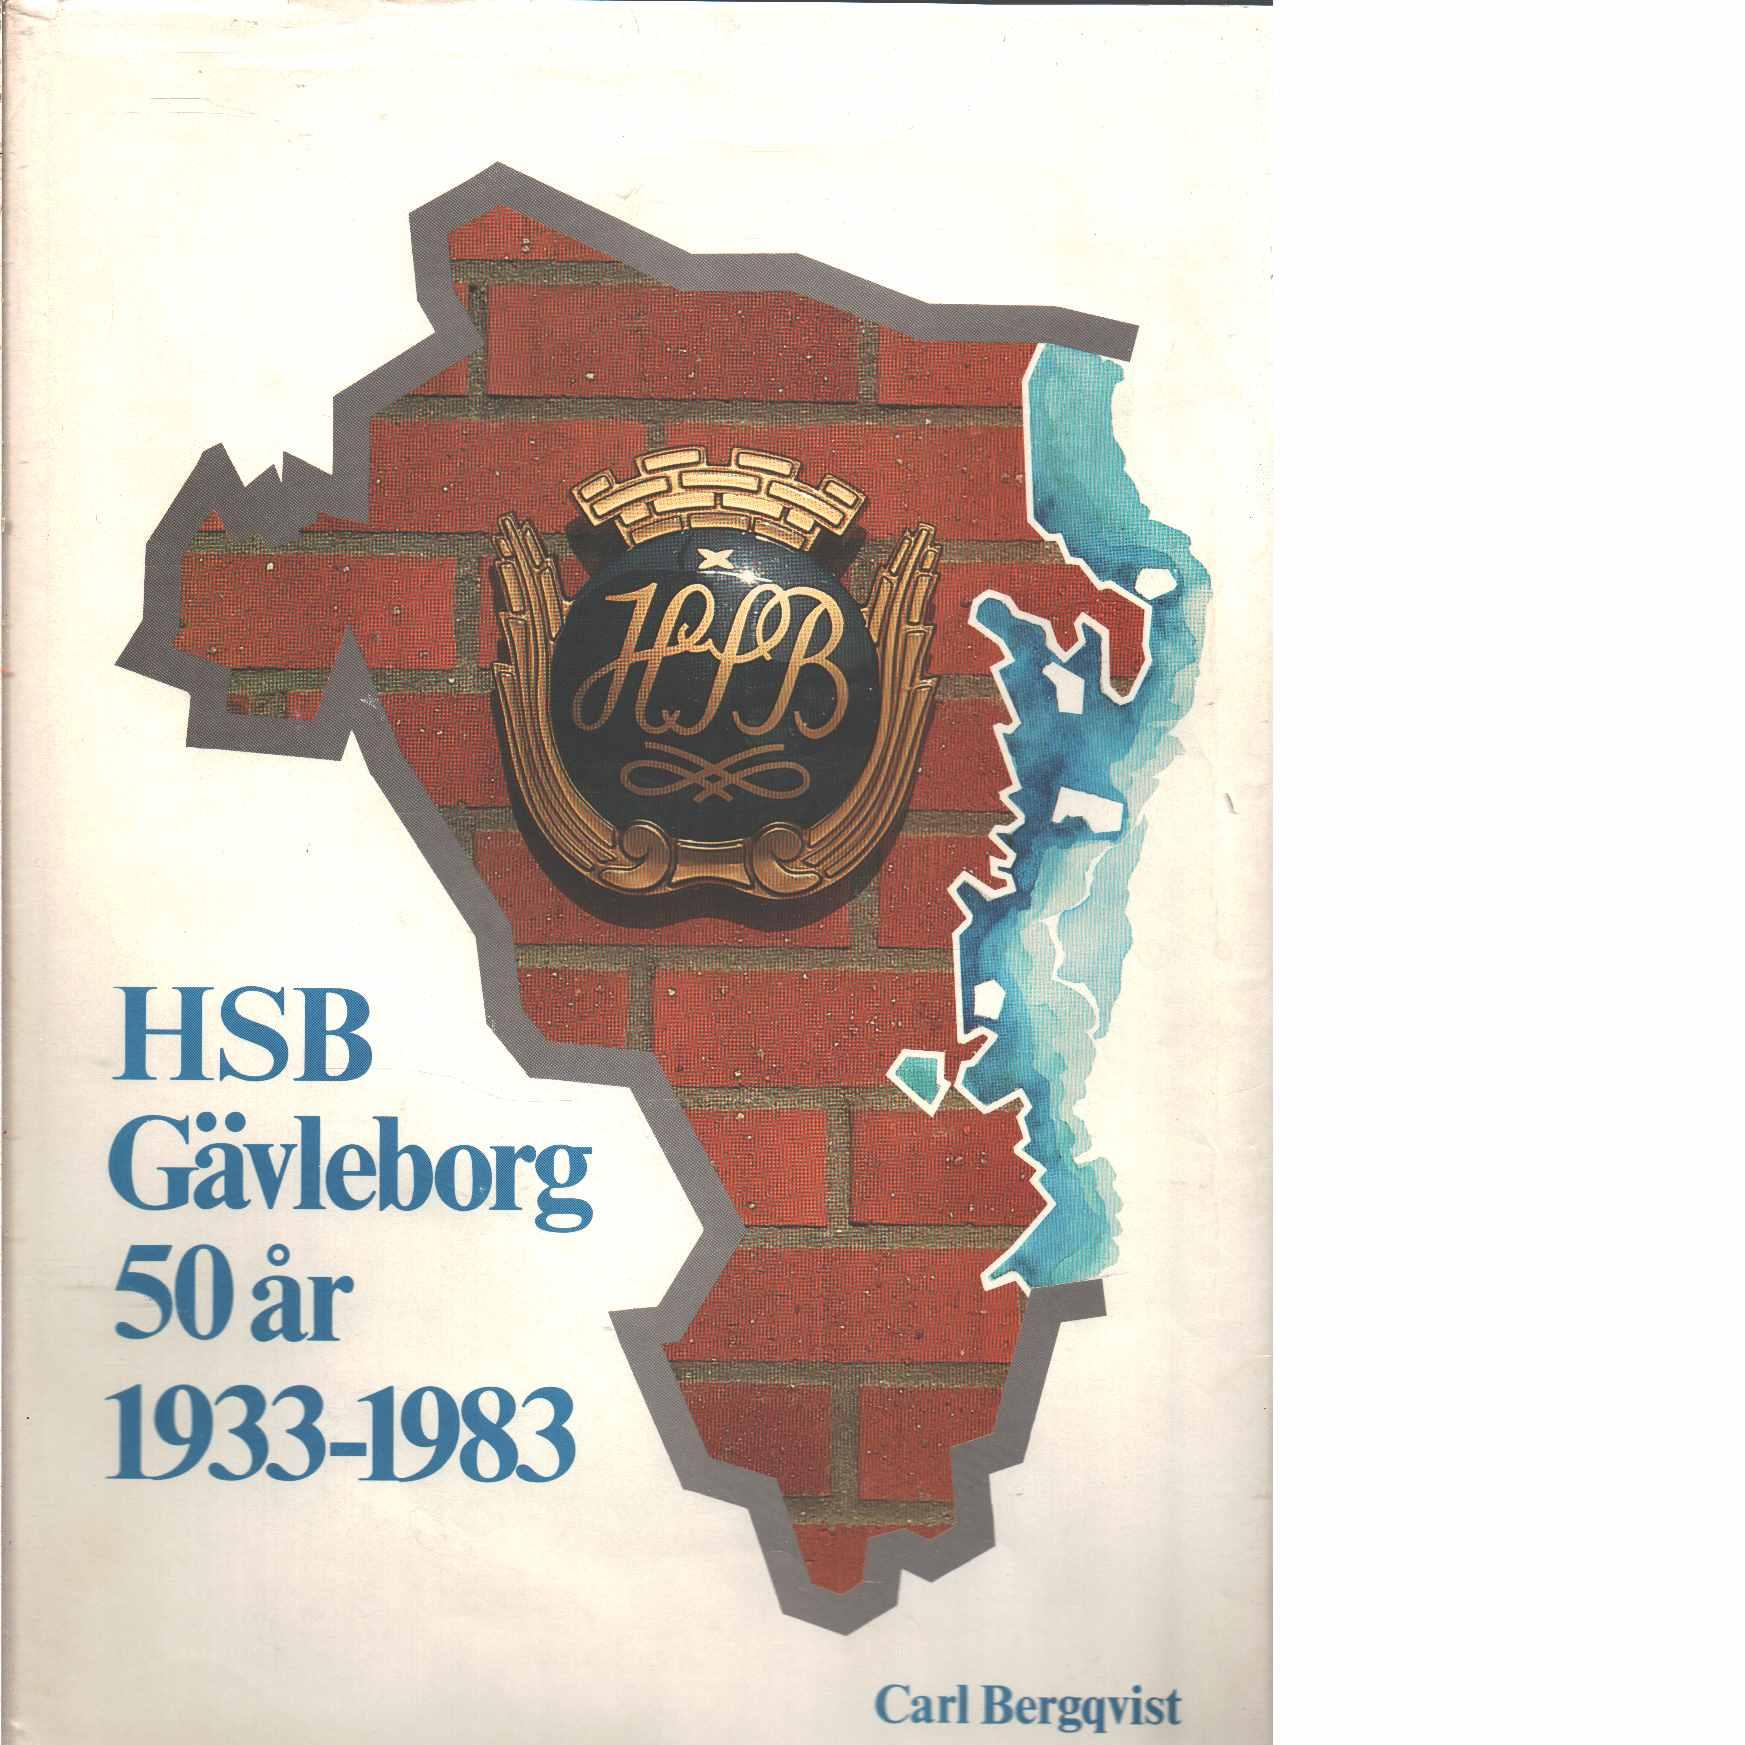 HSB Gävleborg 50 år : 1933-1983 - Bergqvist, Carl